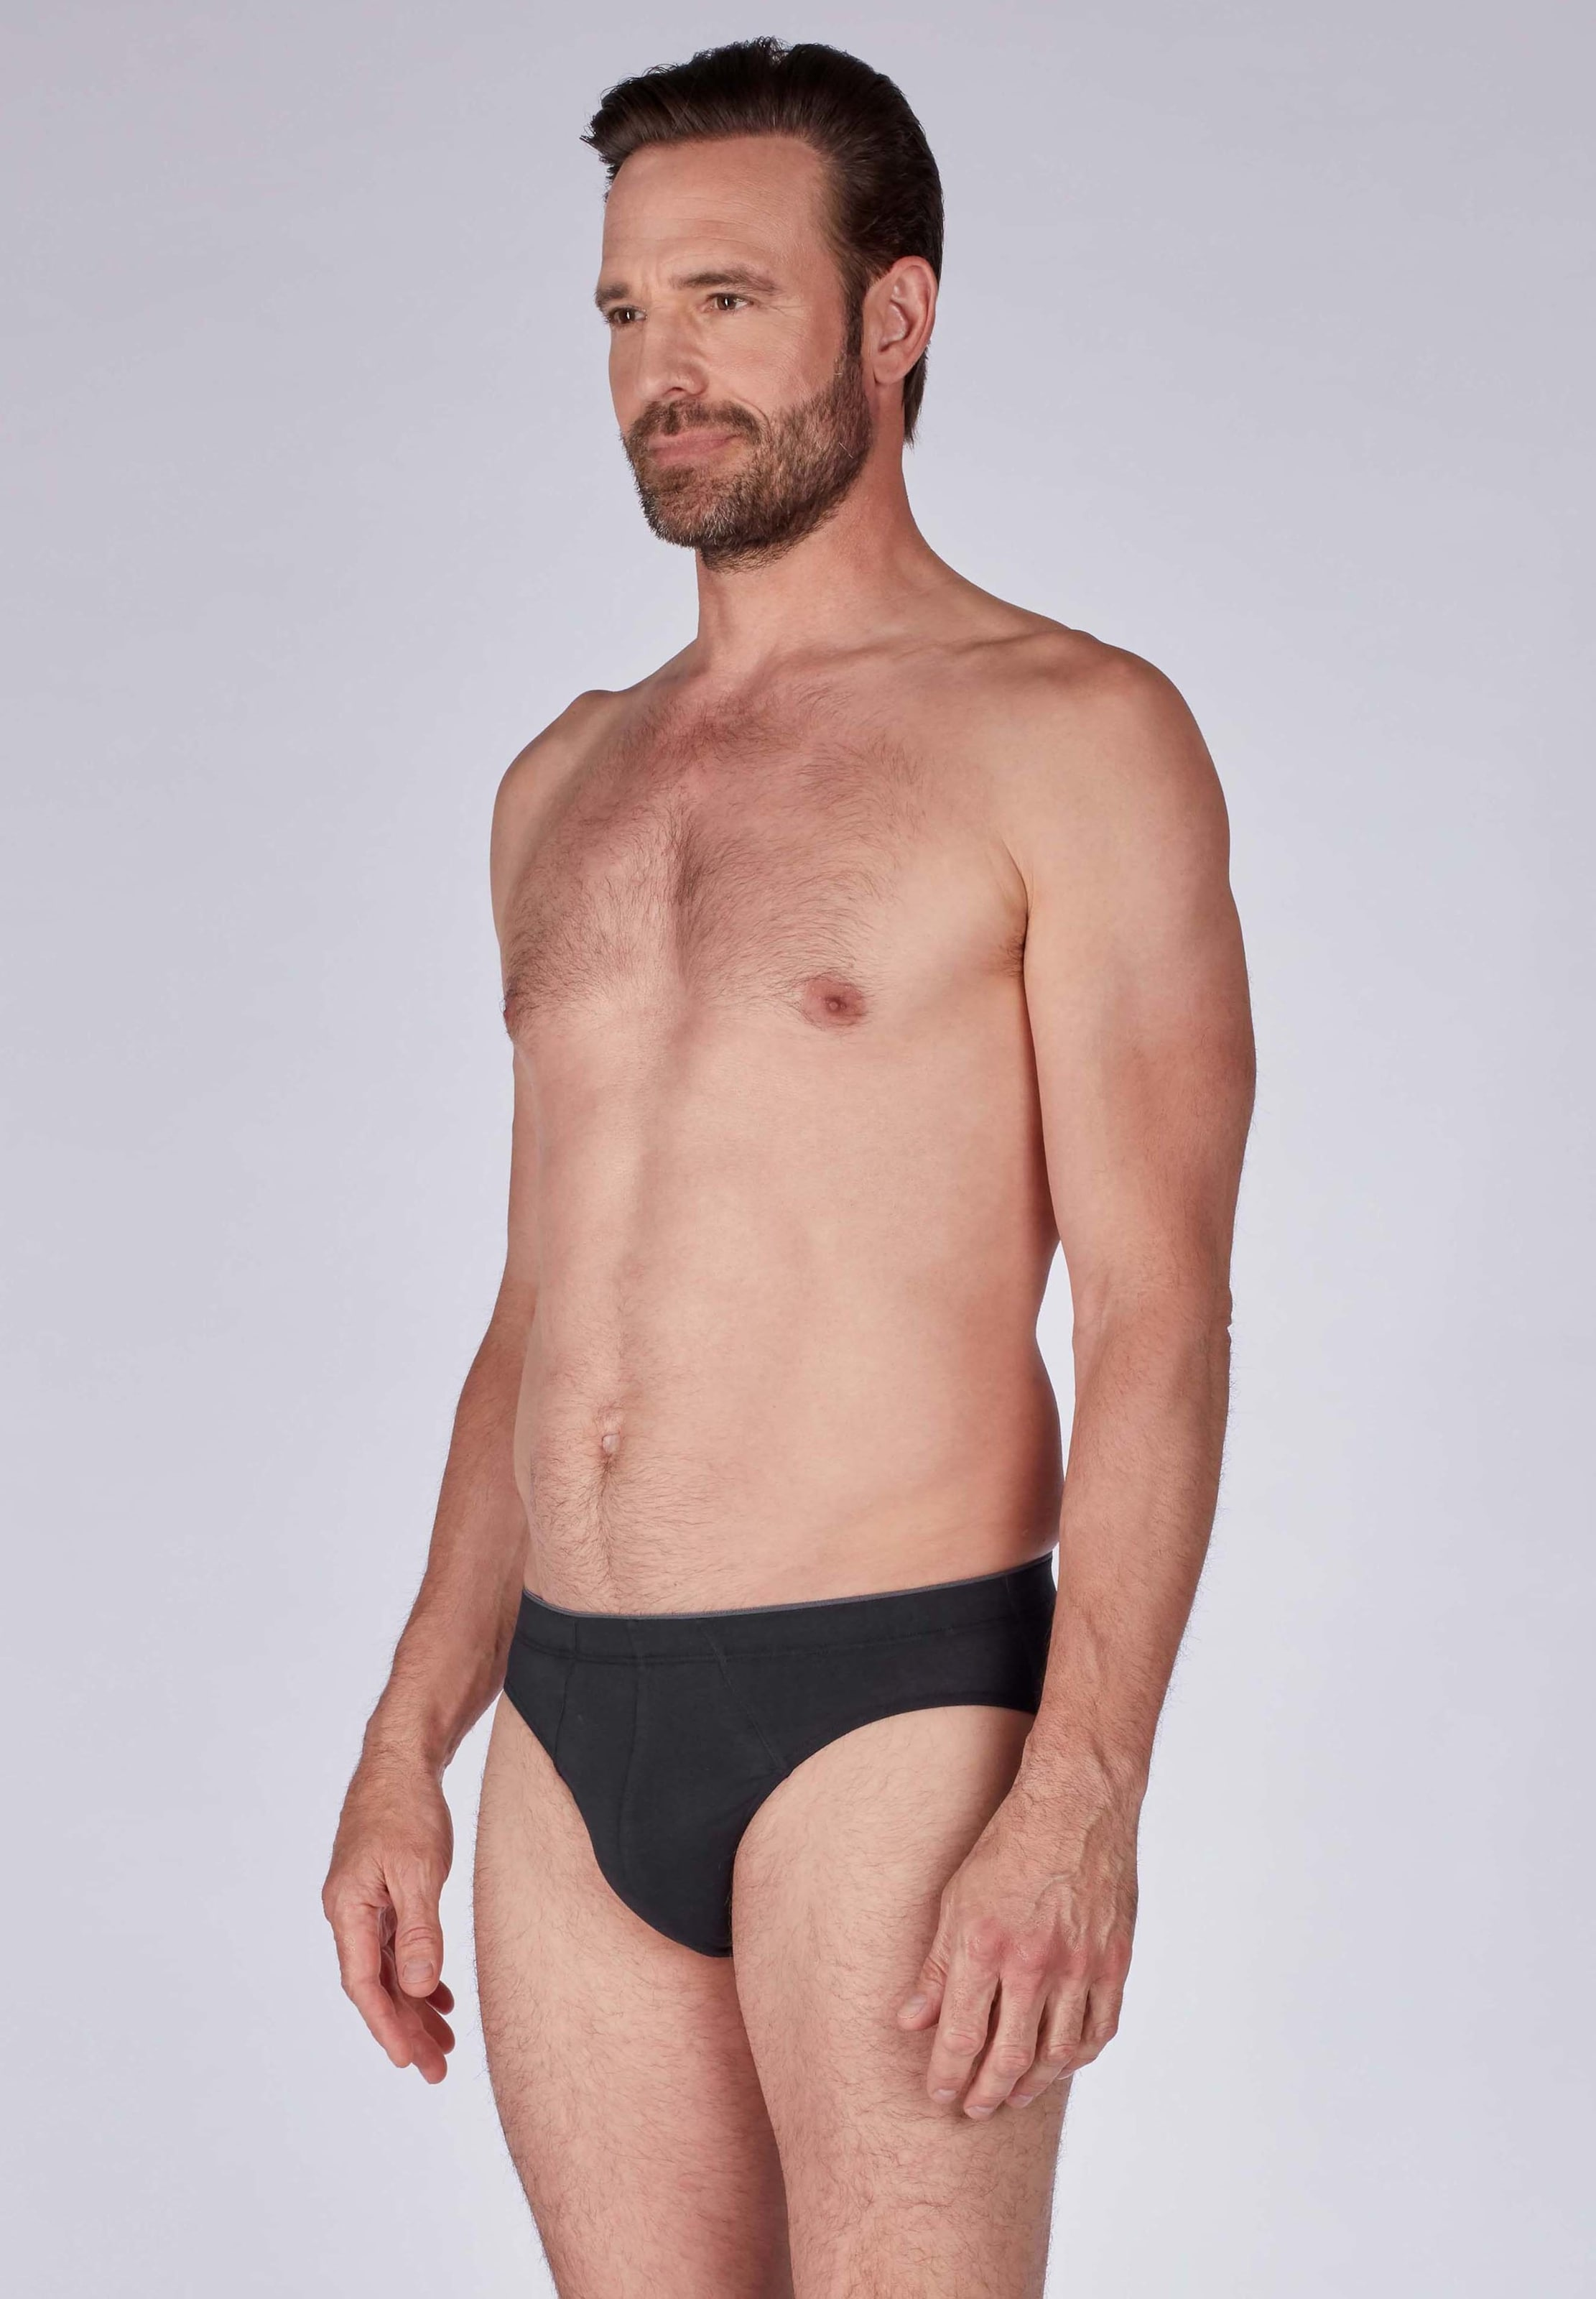 Huber In Huber 'brasil' Unterhosen In Schwarz Schwarz 'brasil' Huber 'brasil' Unterhosen Unterhosen In b6vYfgy7